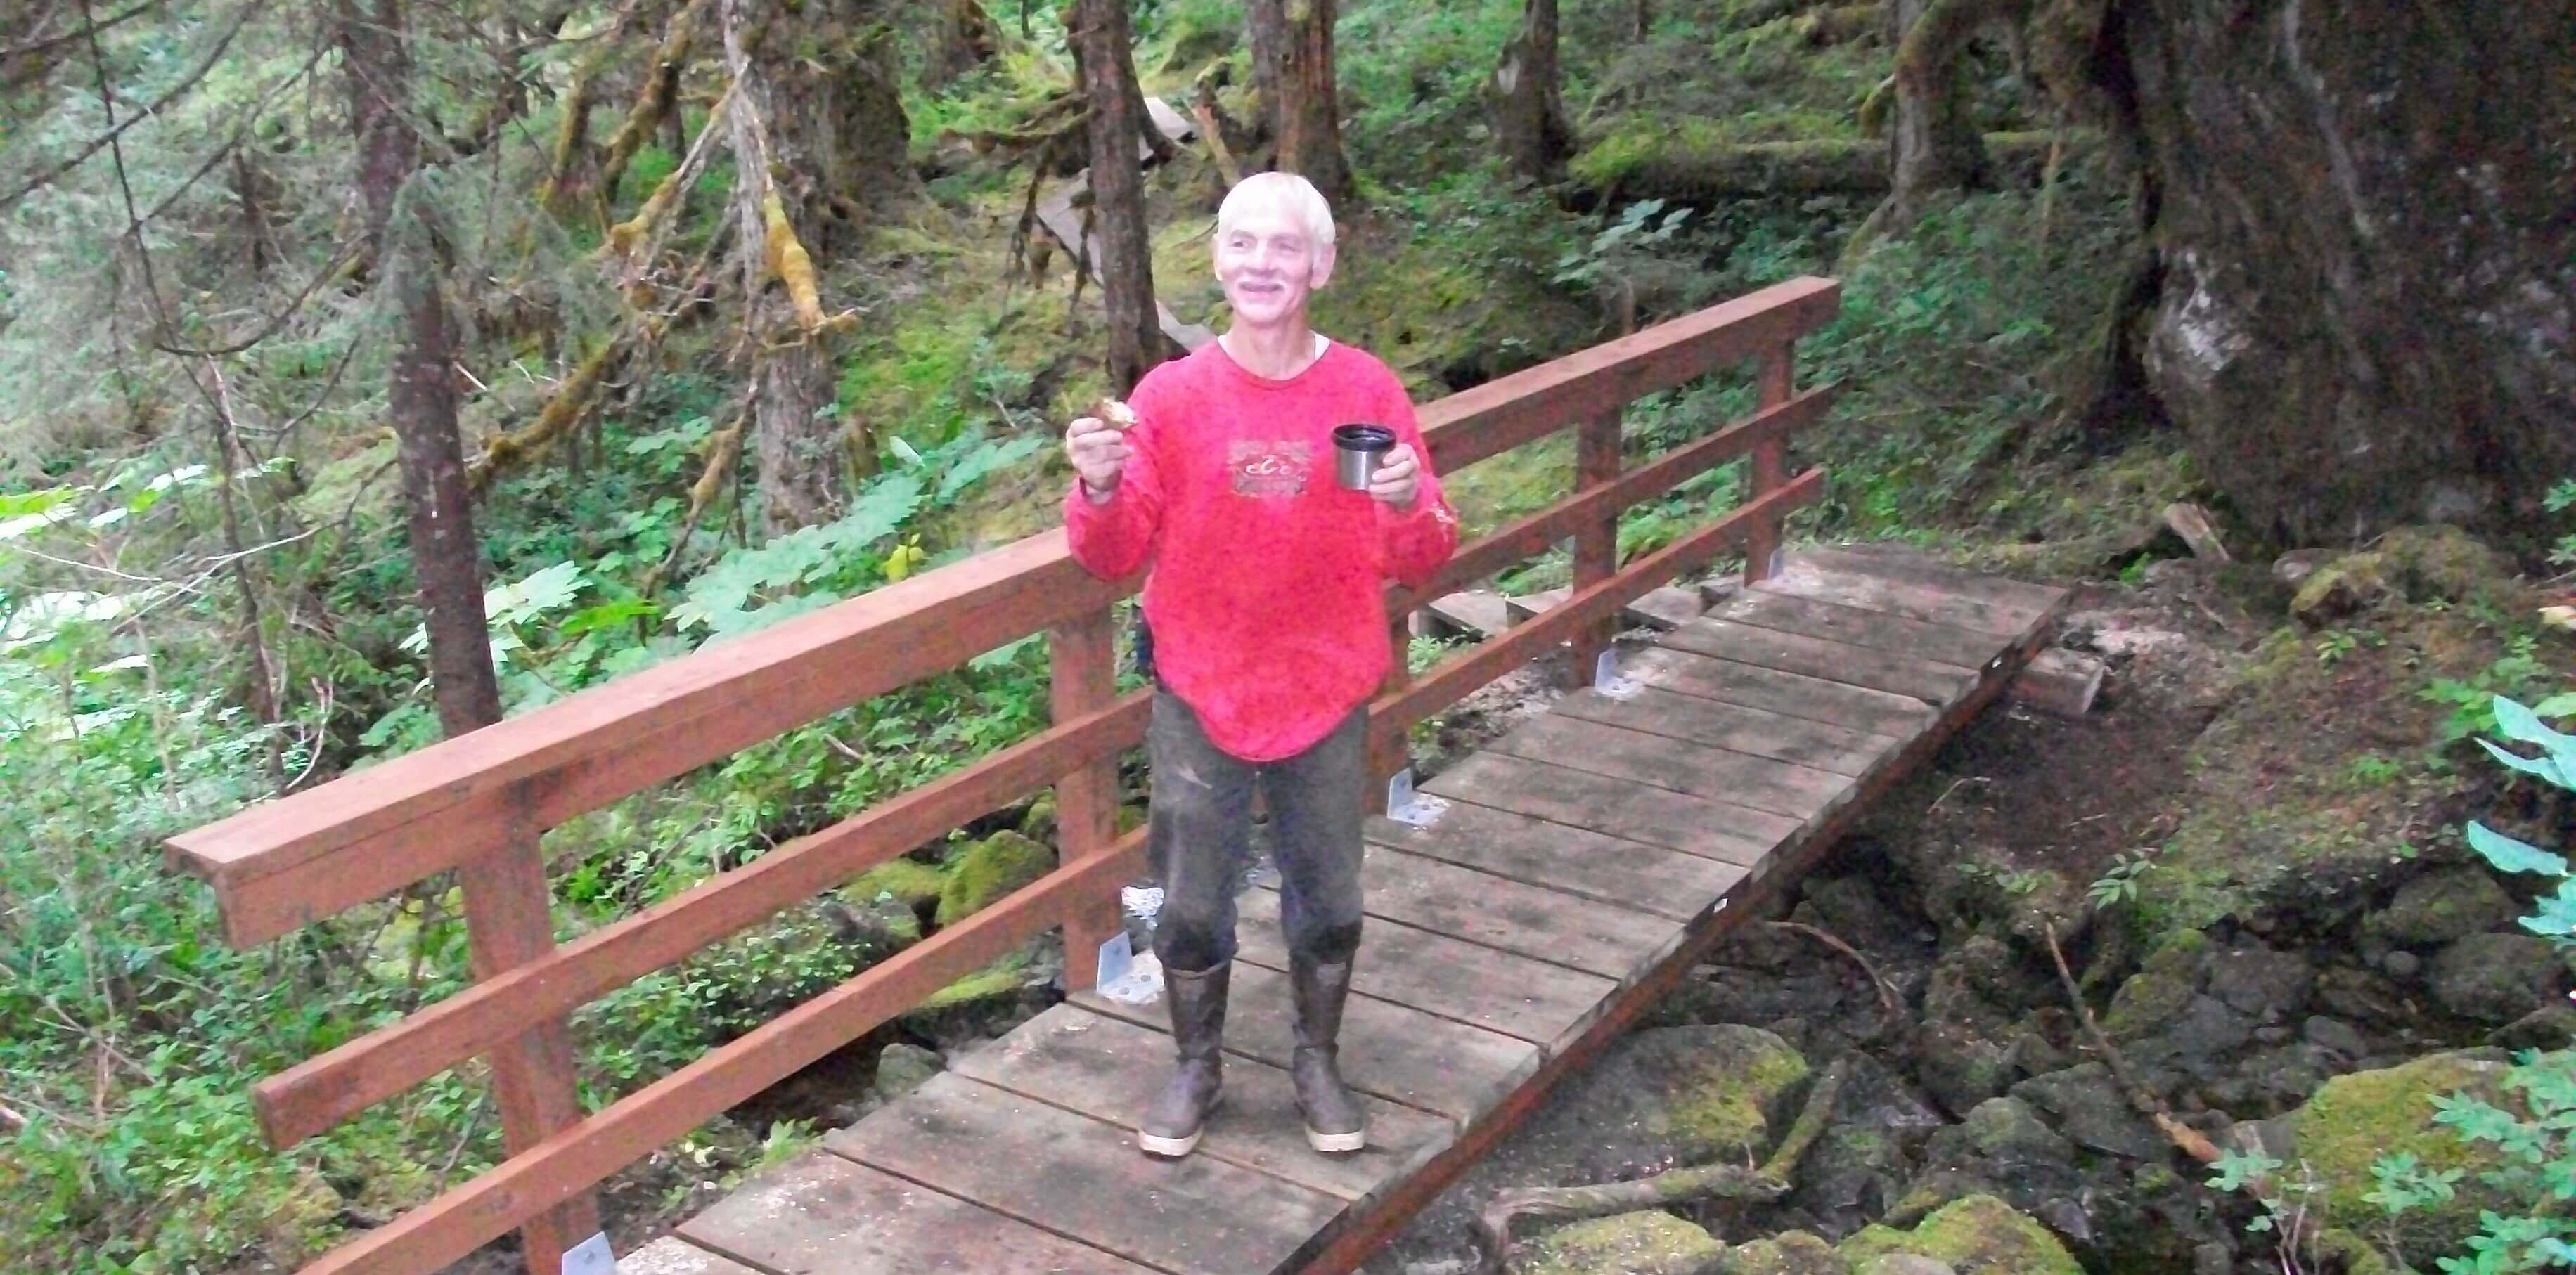 Steve Murphy Testimonial For Energy Boosting D-Ribose